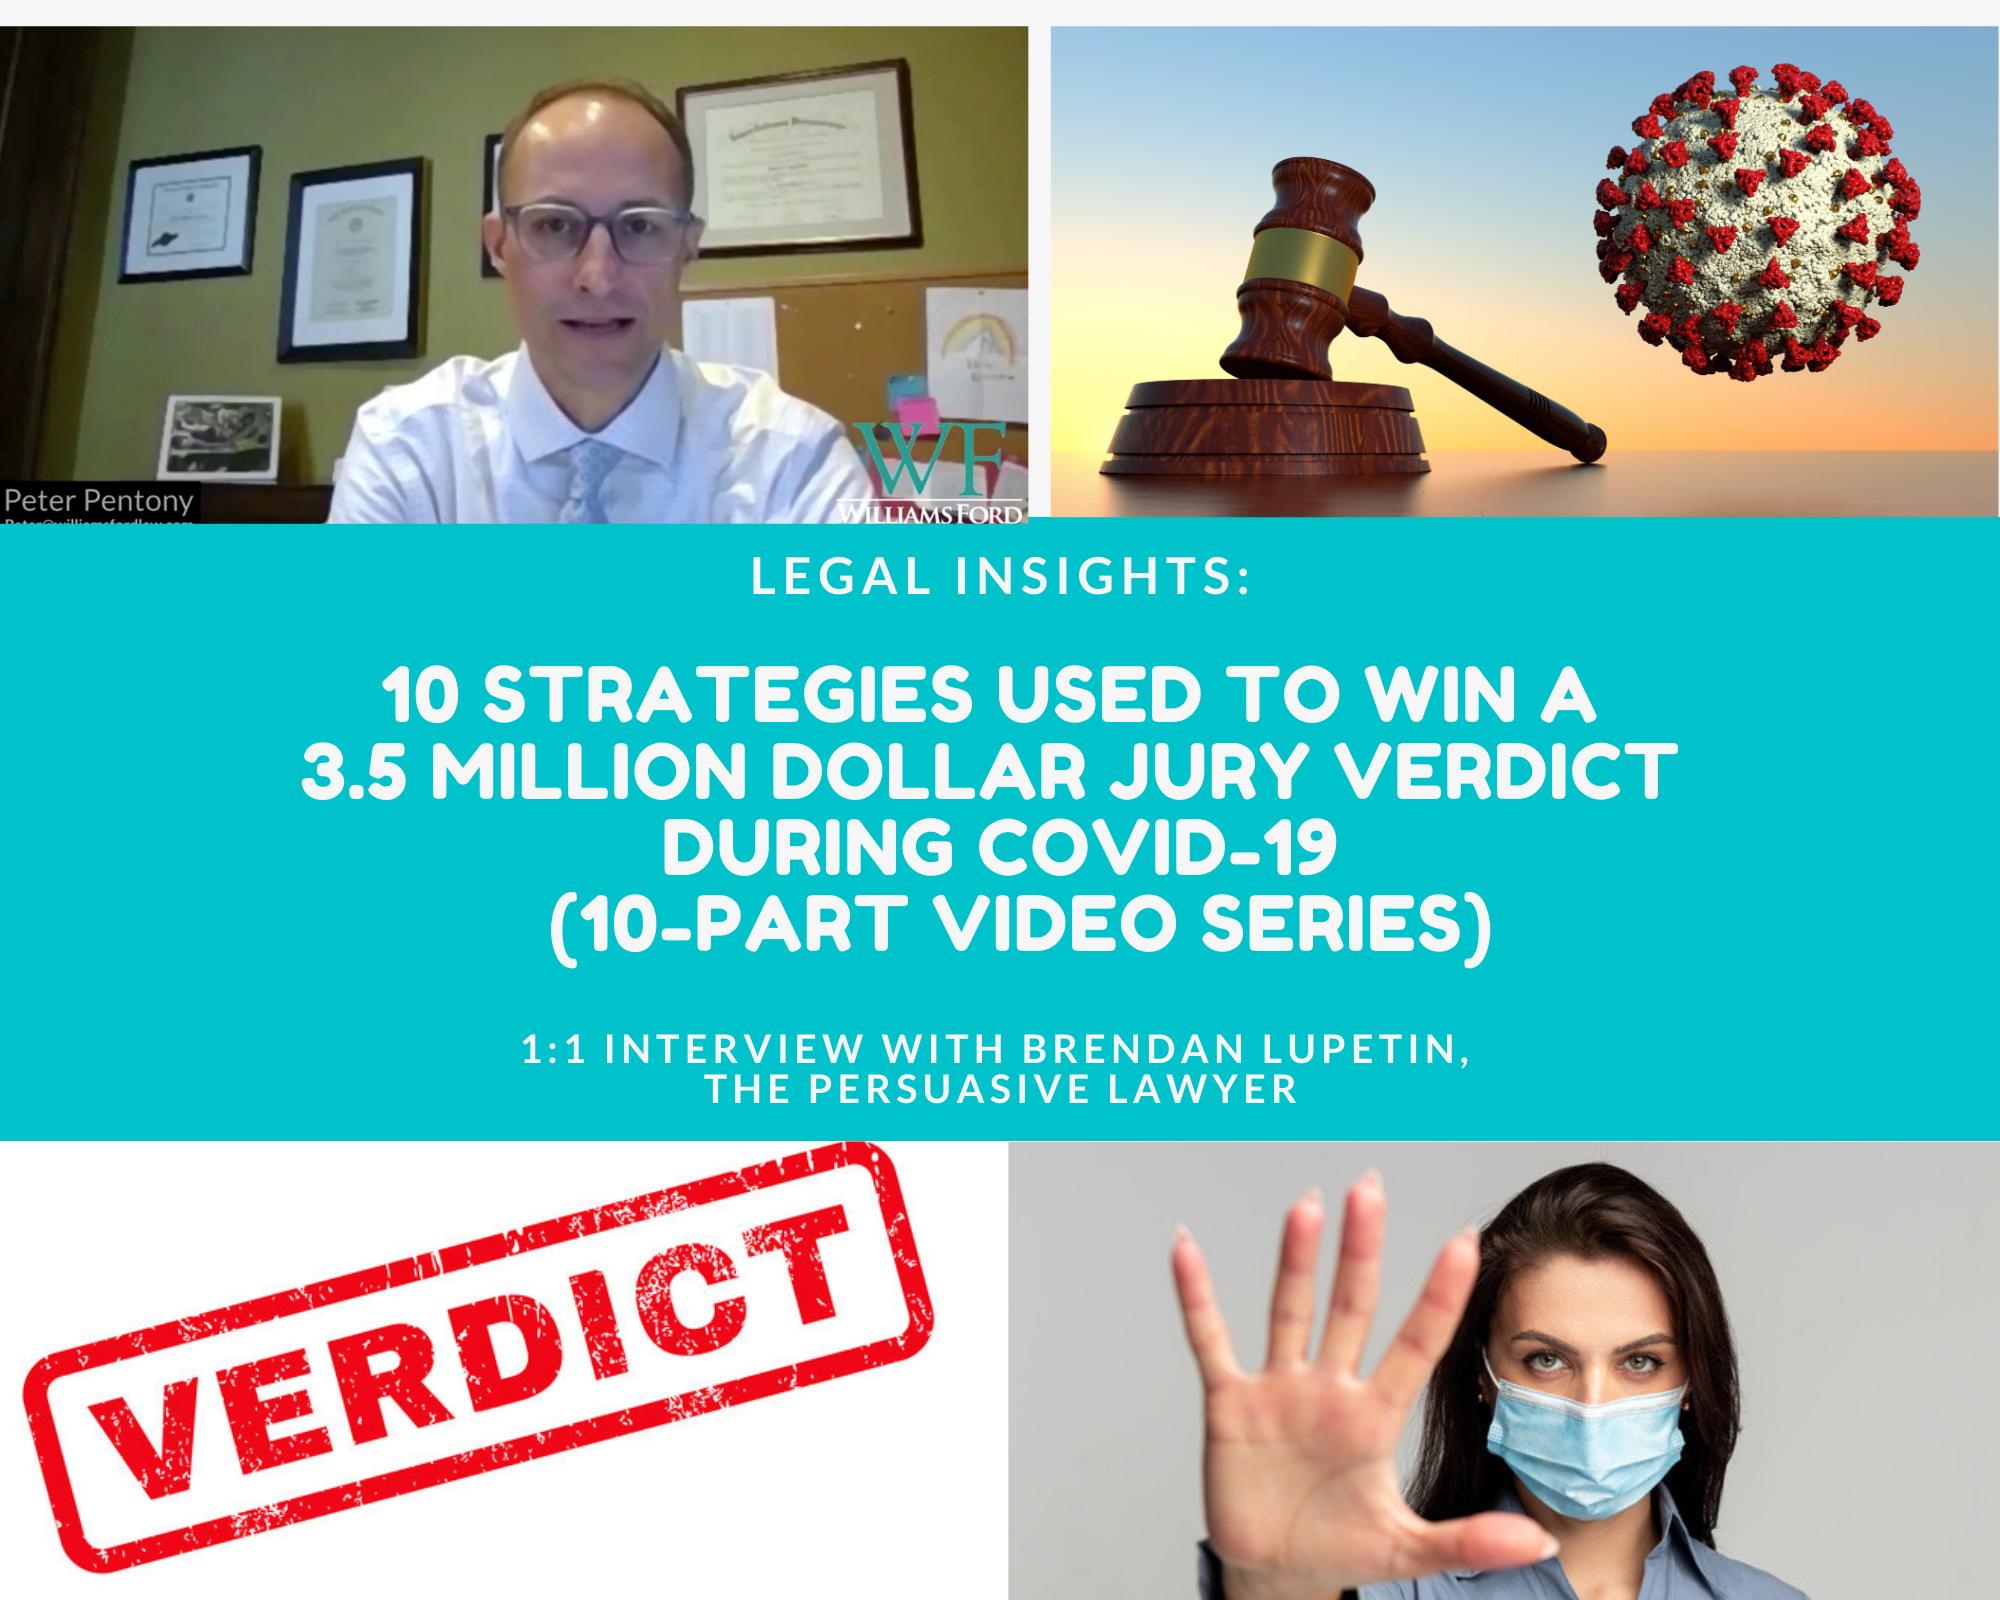 Pete's 3.5 Million Verdict